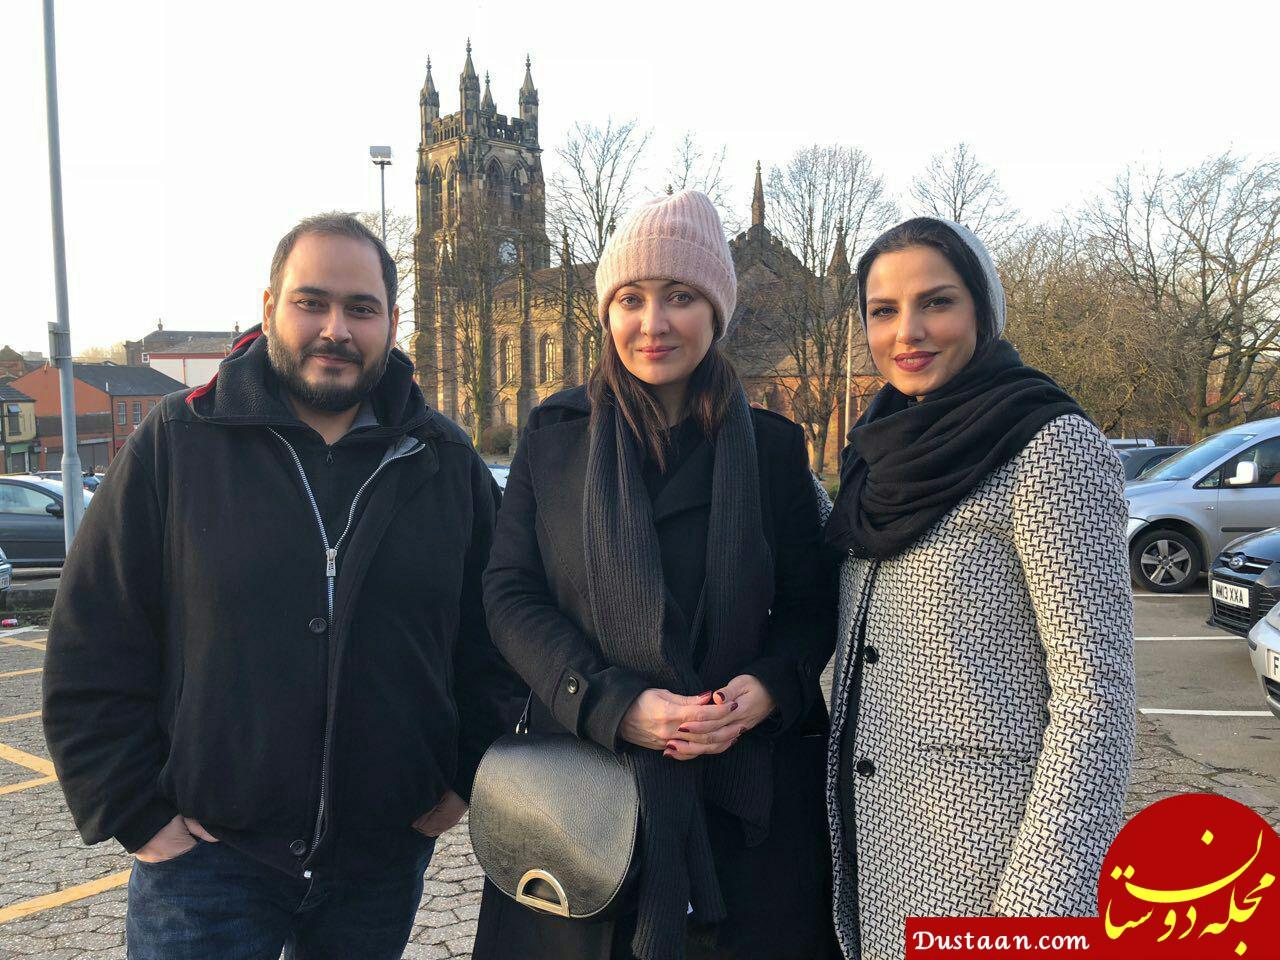 www.dustaan.com خلاصه داستان و بازیگران فیلم سینمایی «مصائب شیرین ۲»